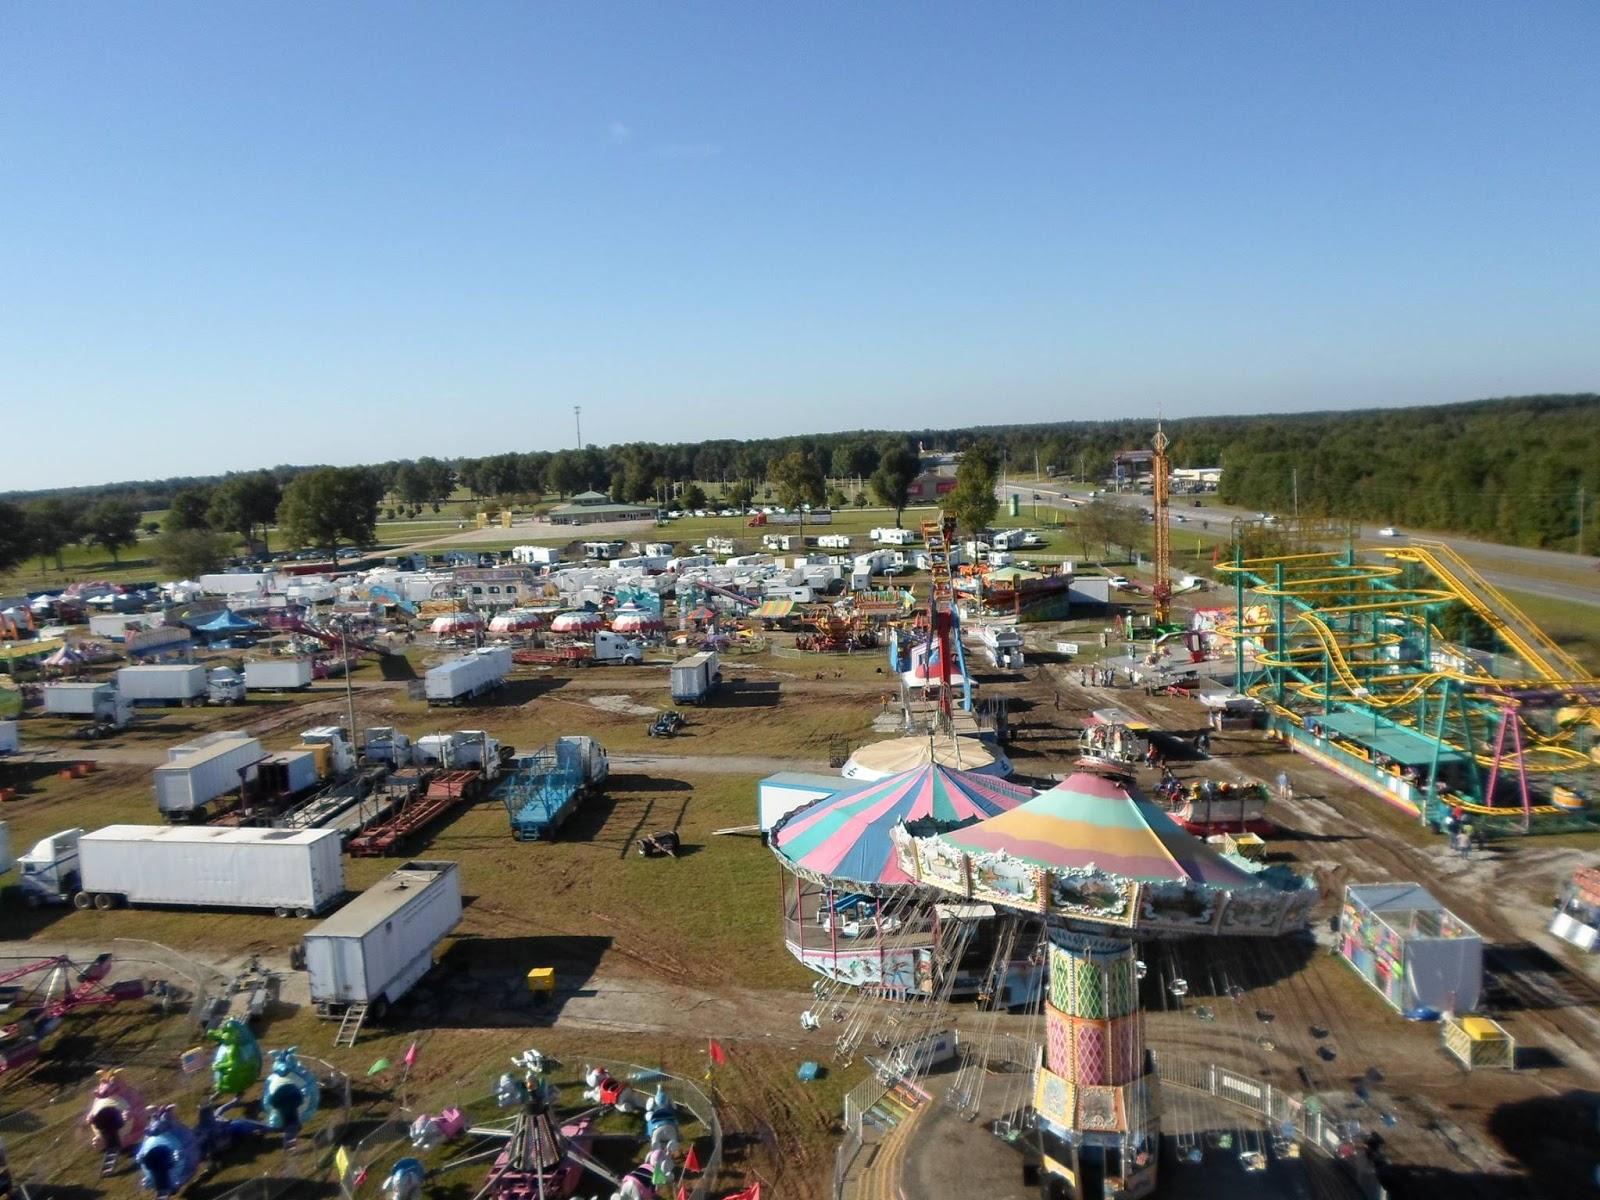 Georgia state fair atlanta motor speedway for Atlanta motor speedway fair 2017